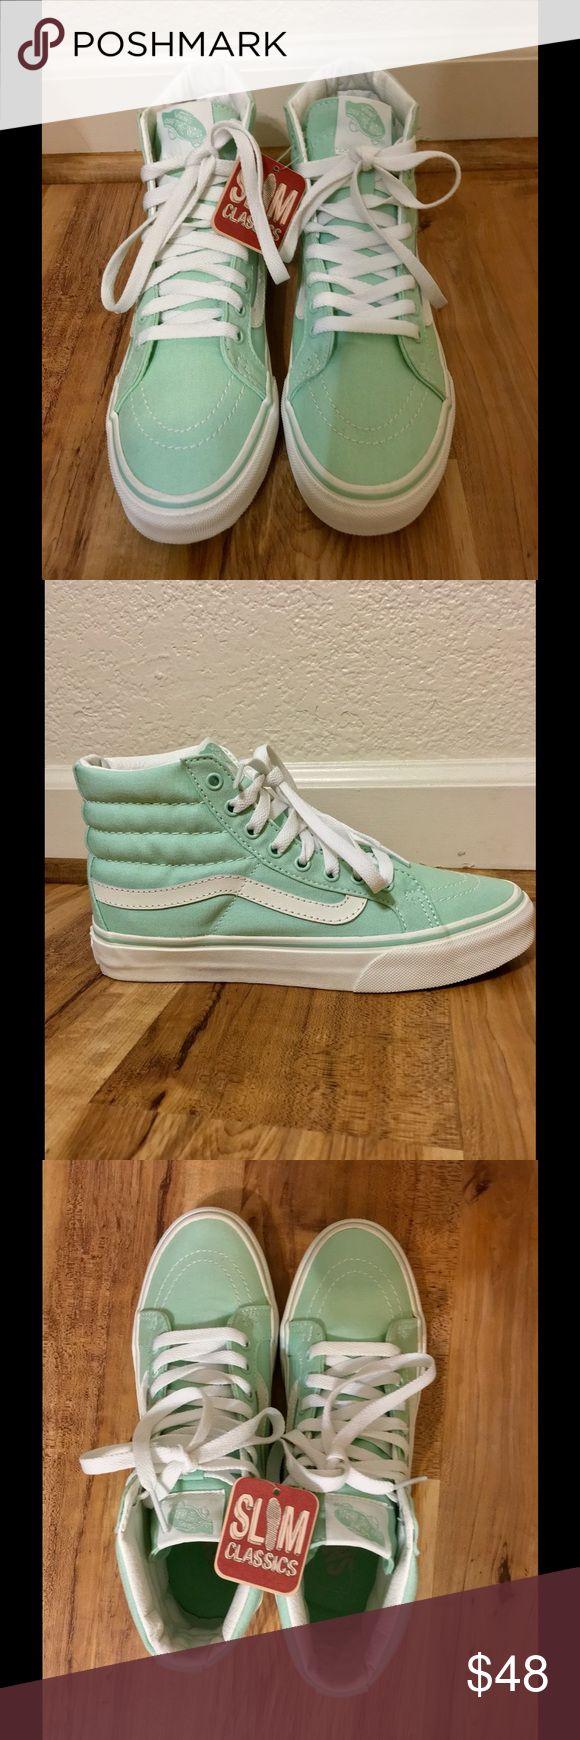 Vans Shoes Vans Light Mint High Top Skateboard Sneakers! Women's Size 7 NWT Slim Classics! Vans Shoes